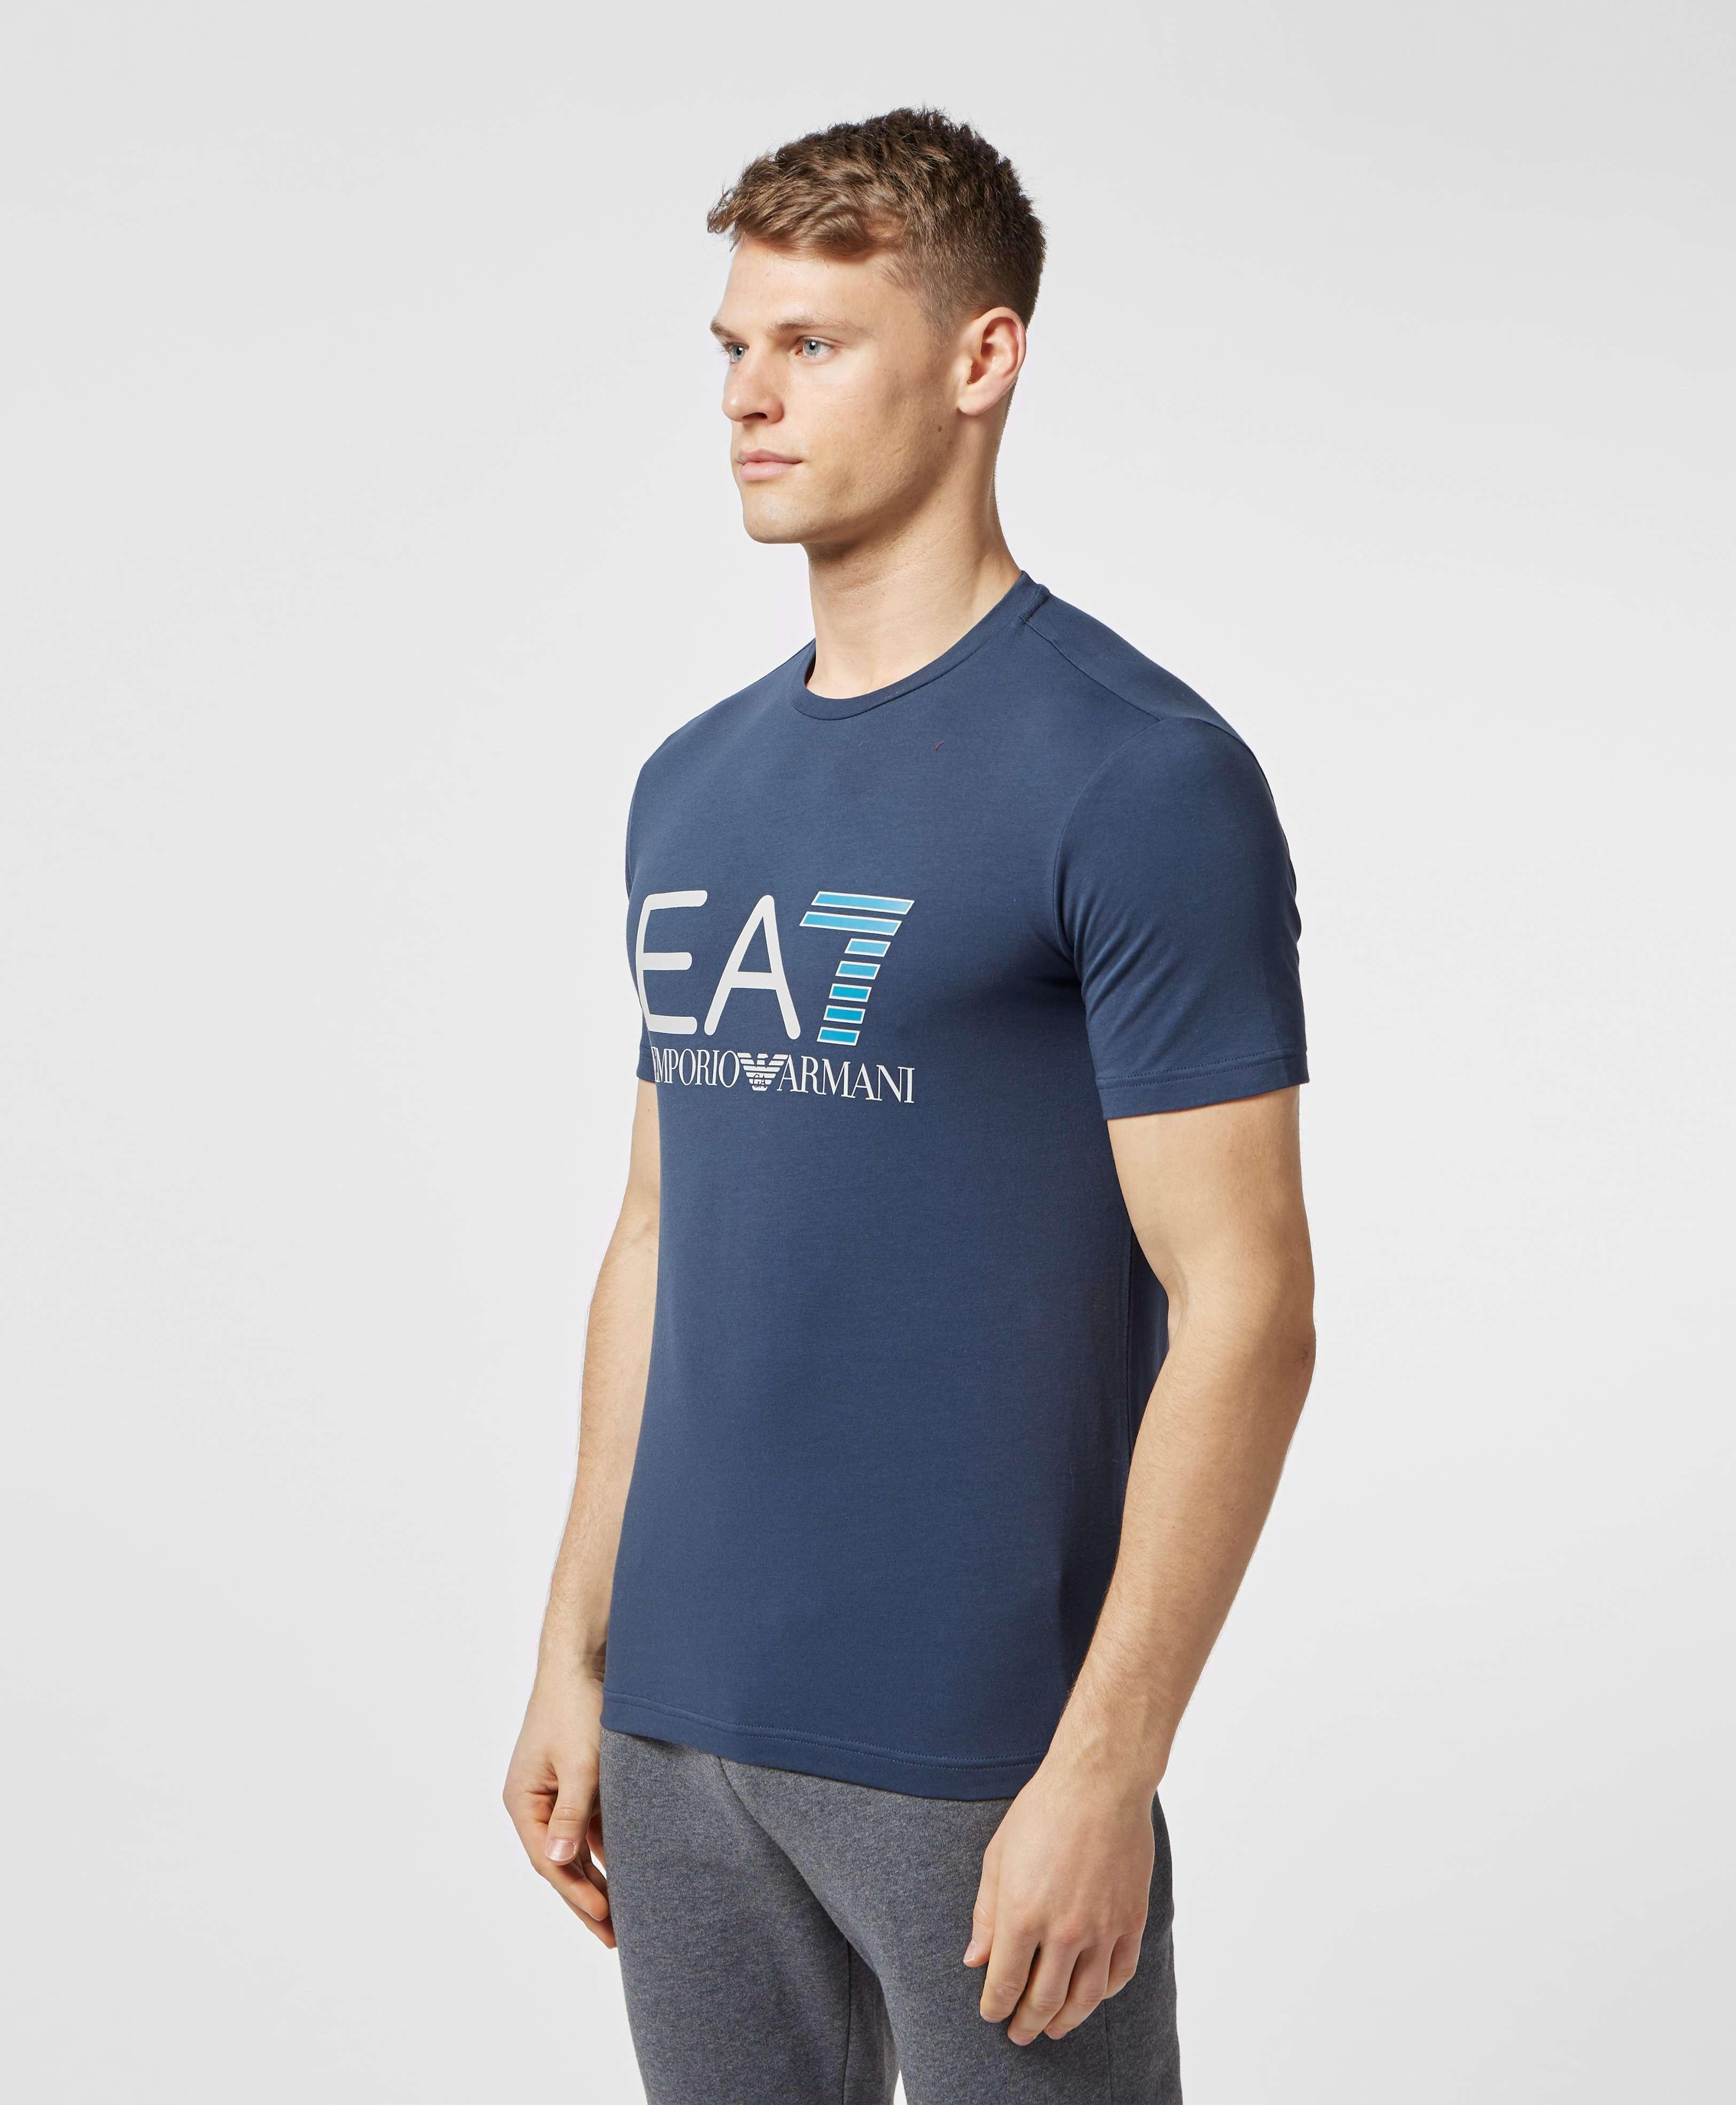 Emporio Armani EA7 Large Logo Short Sleeve T-Shirt